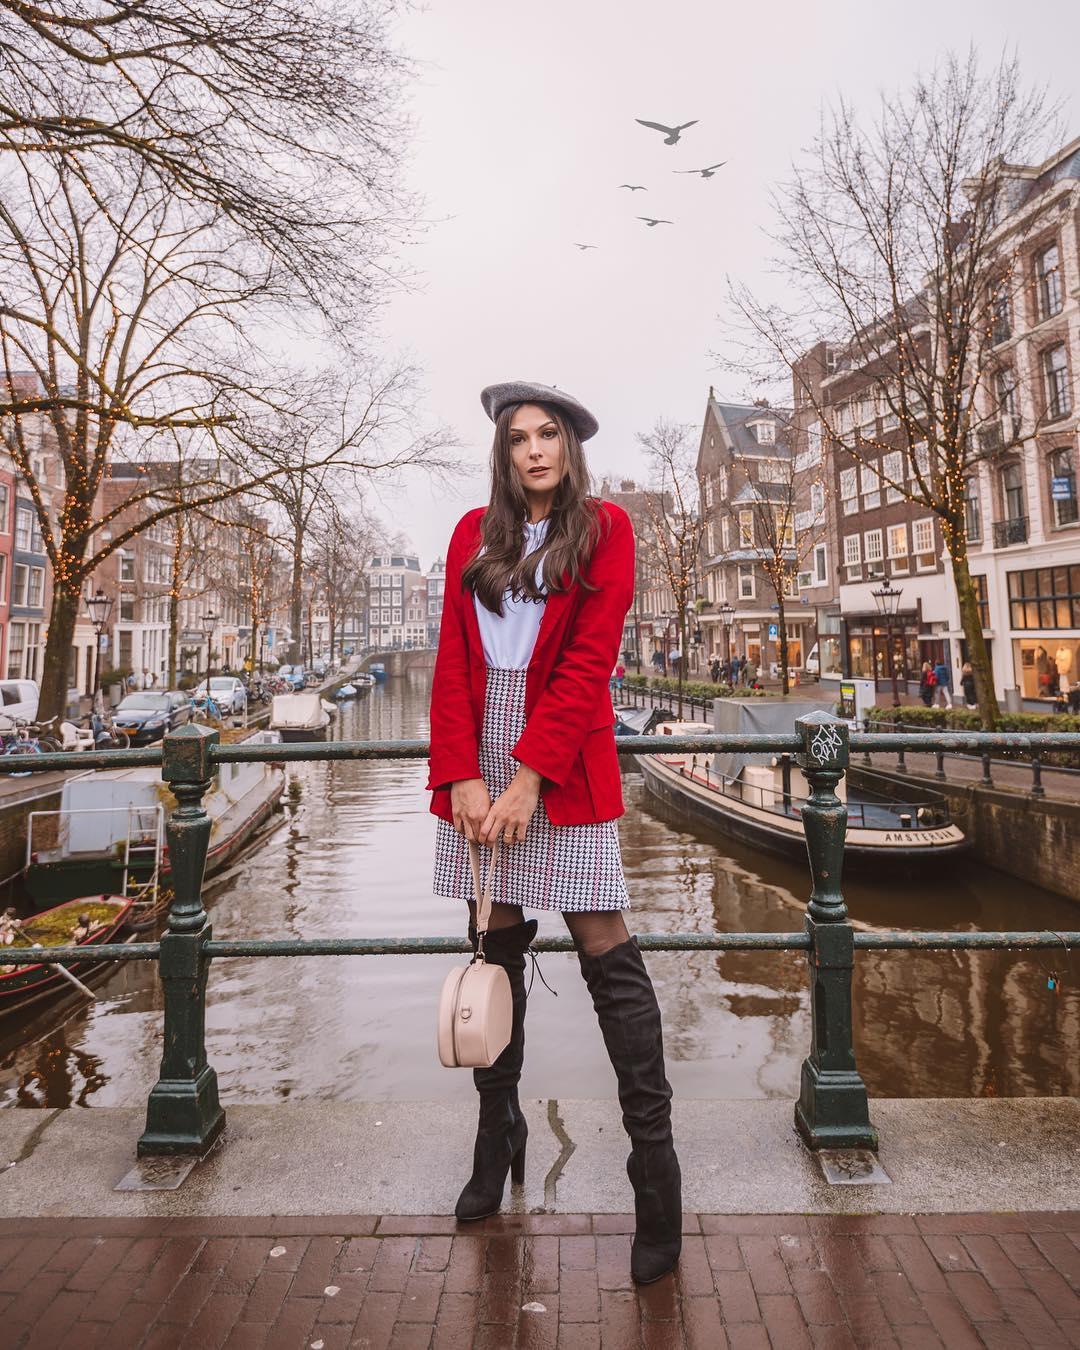 Thanh pho Amsterdam